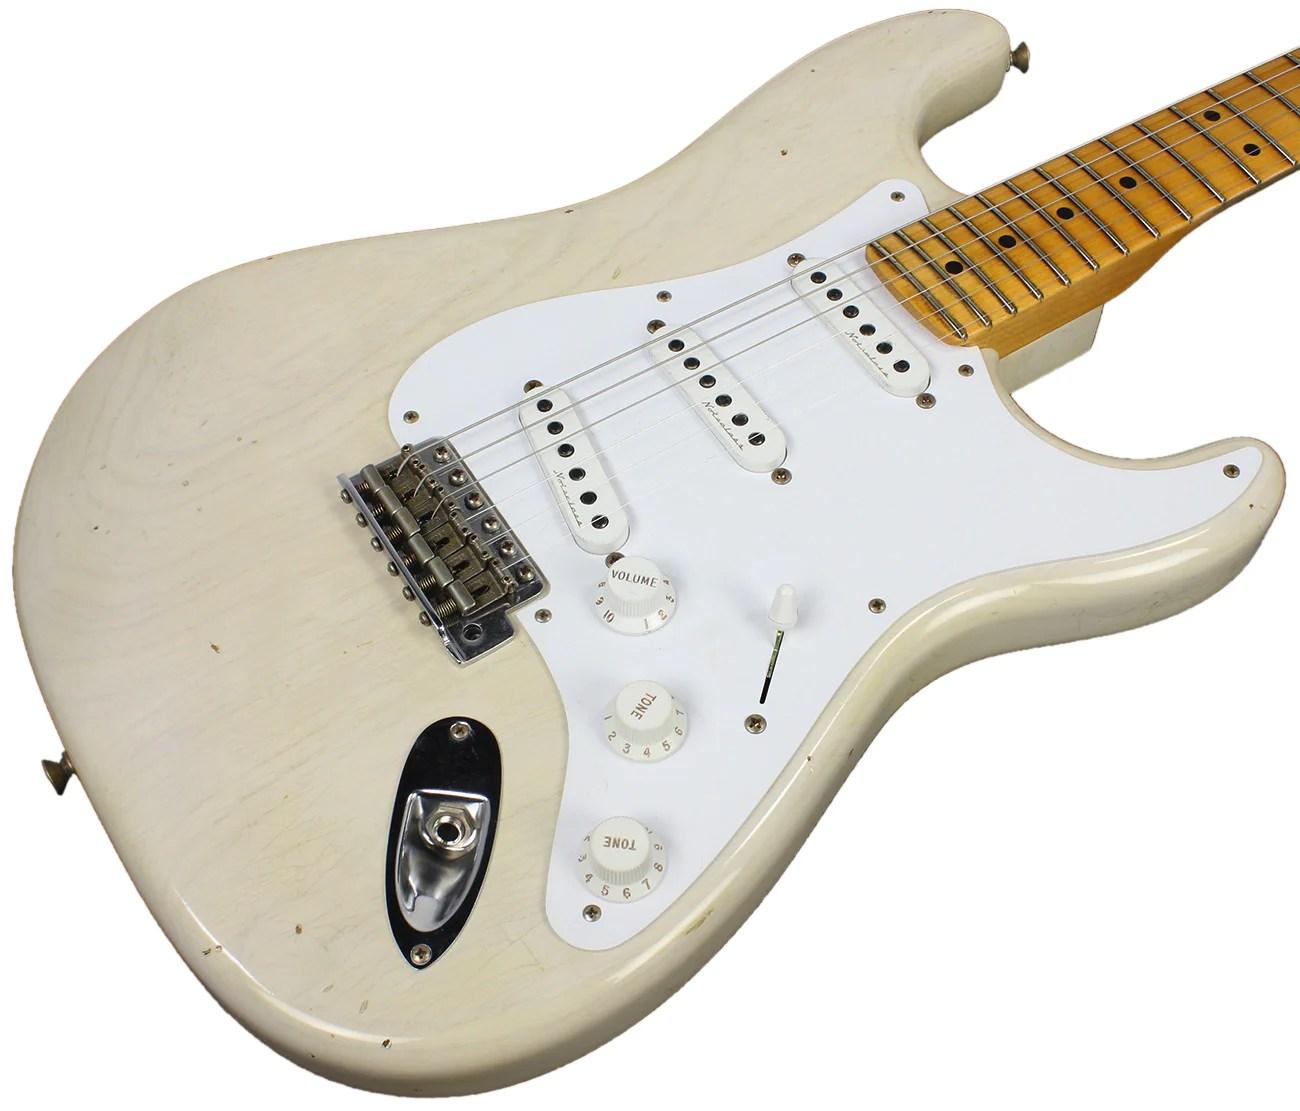 fender custom shop eric clapton journeyman stratocaster relic guitar aged white blonde humbucker music [ 1300 x 1111 Pixel ]